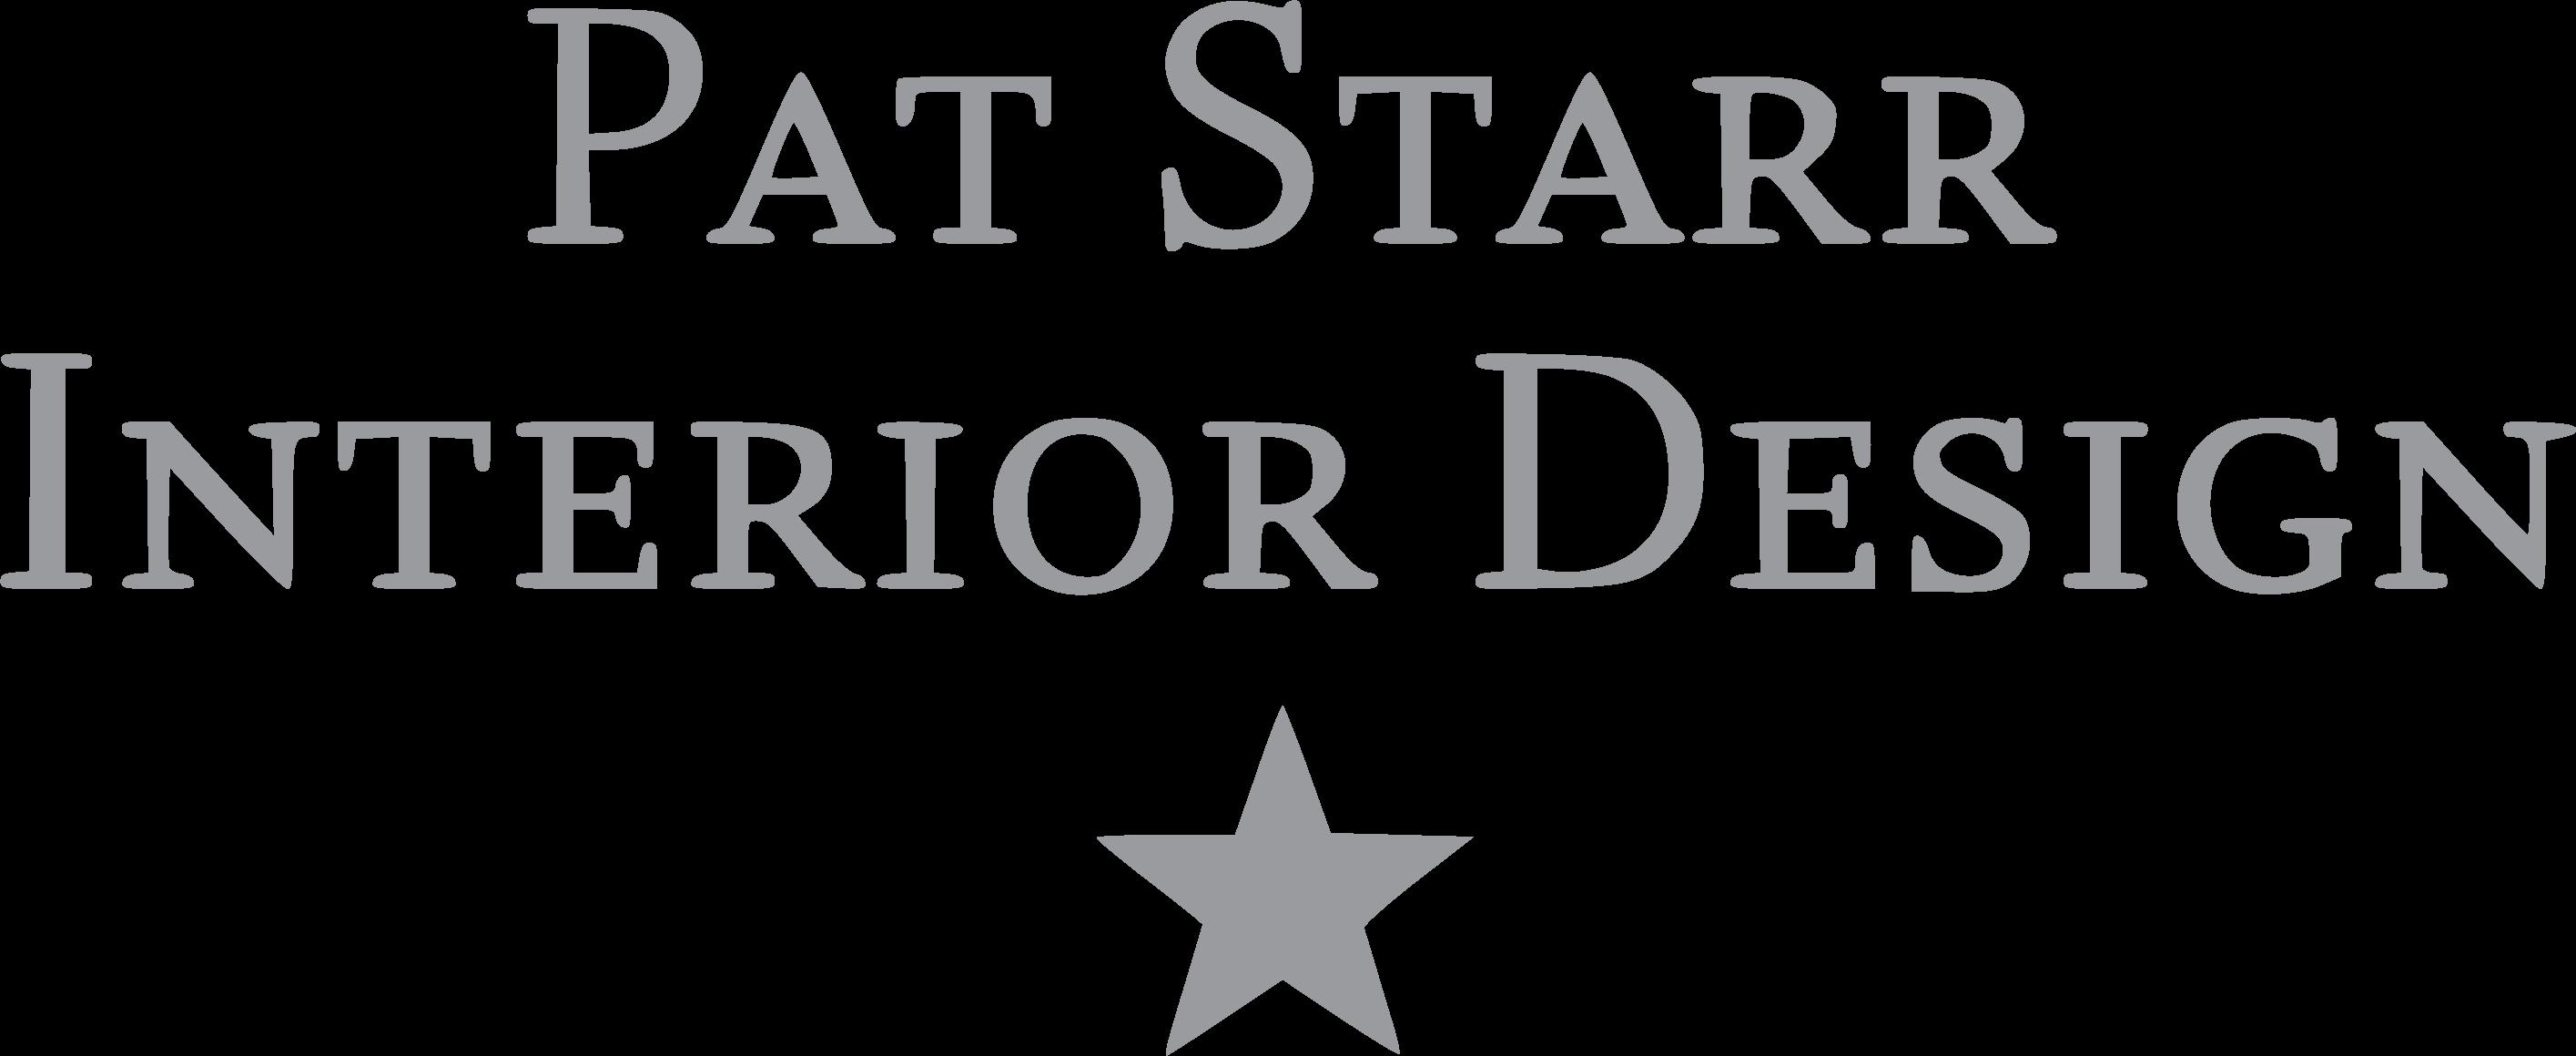 Pat Starr Design